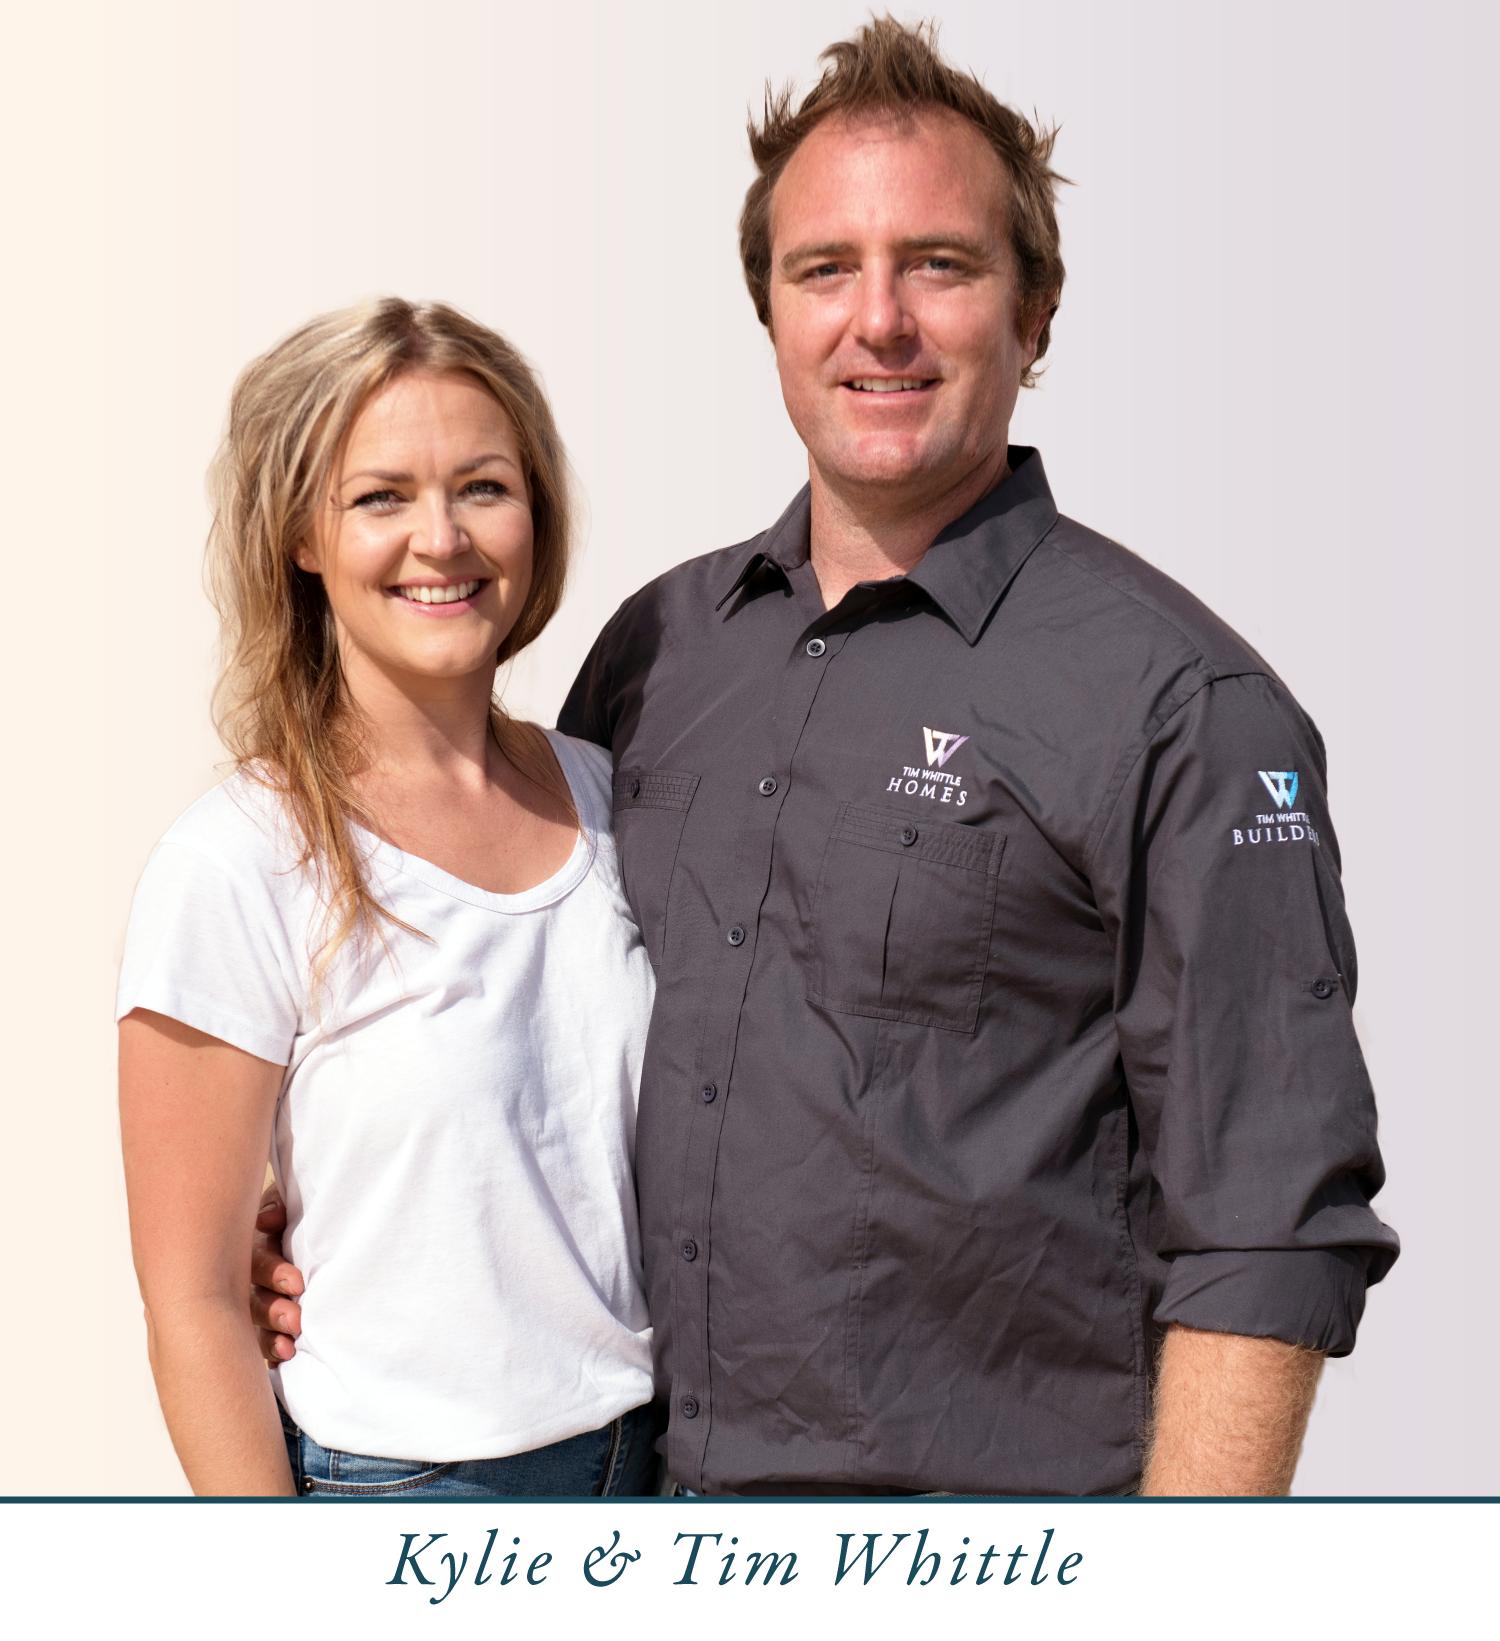 Portrait-Caption-BG-Kylie-and-Tim-Whittle-Homes-Builders-Morrinsville-Matamata-Waihi-Te-Aroha-Waikato.png